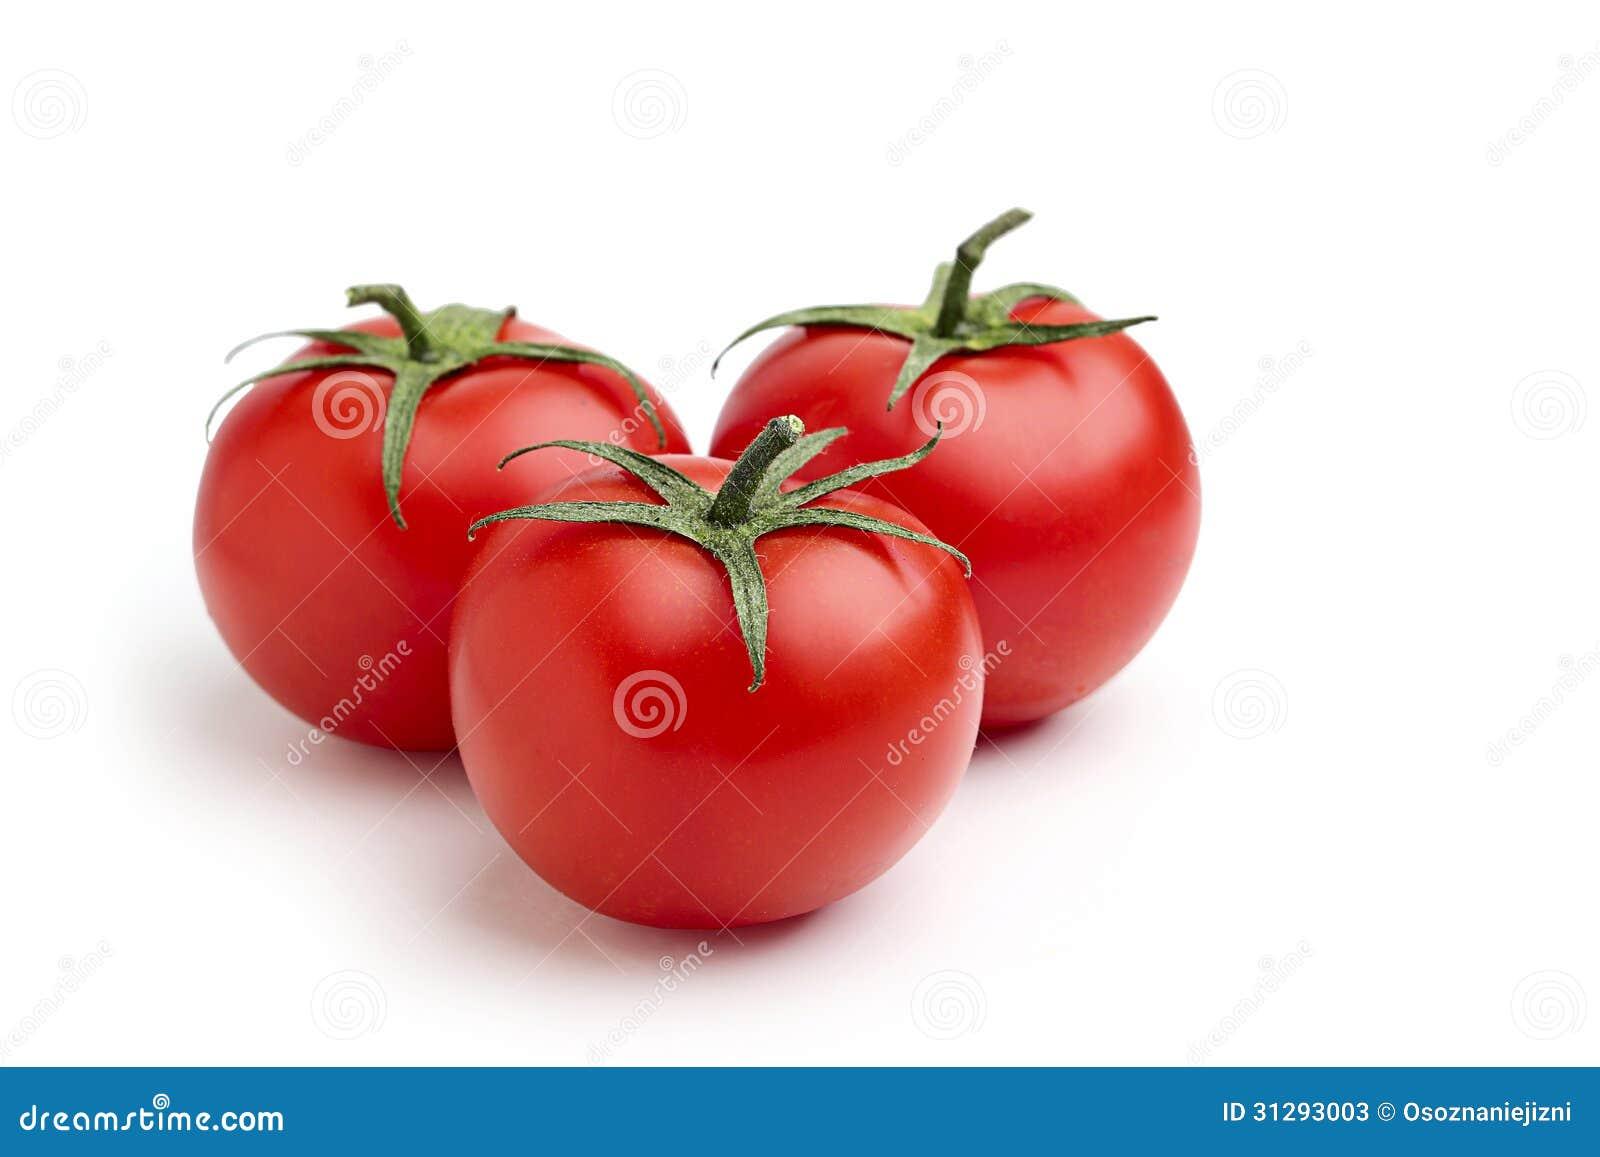 Three red tomatoes.